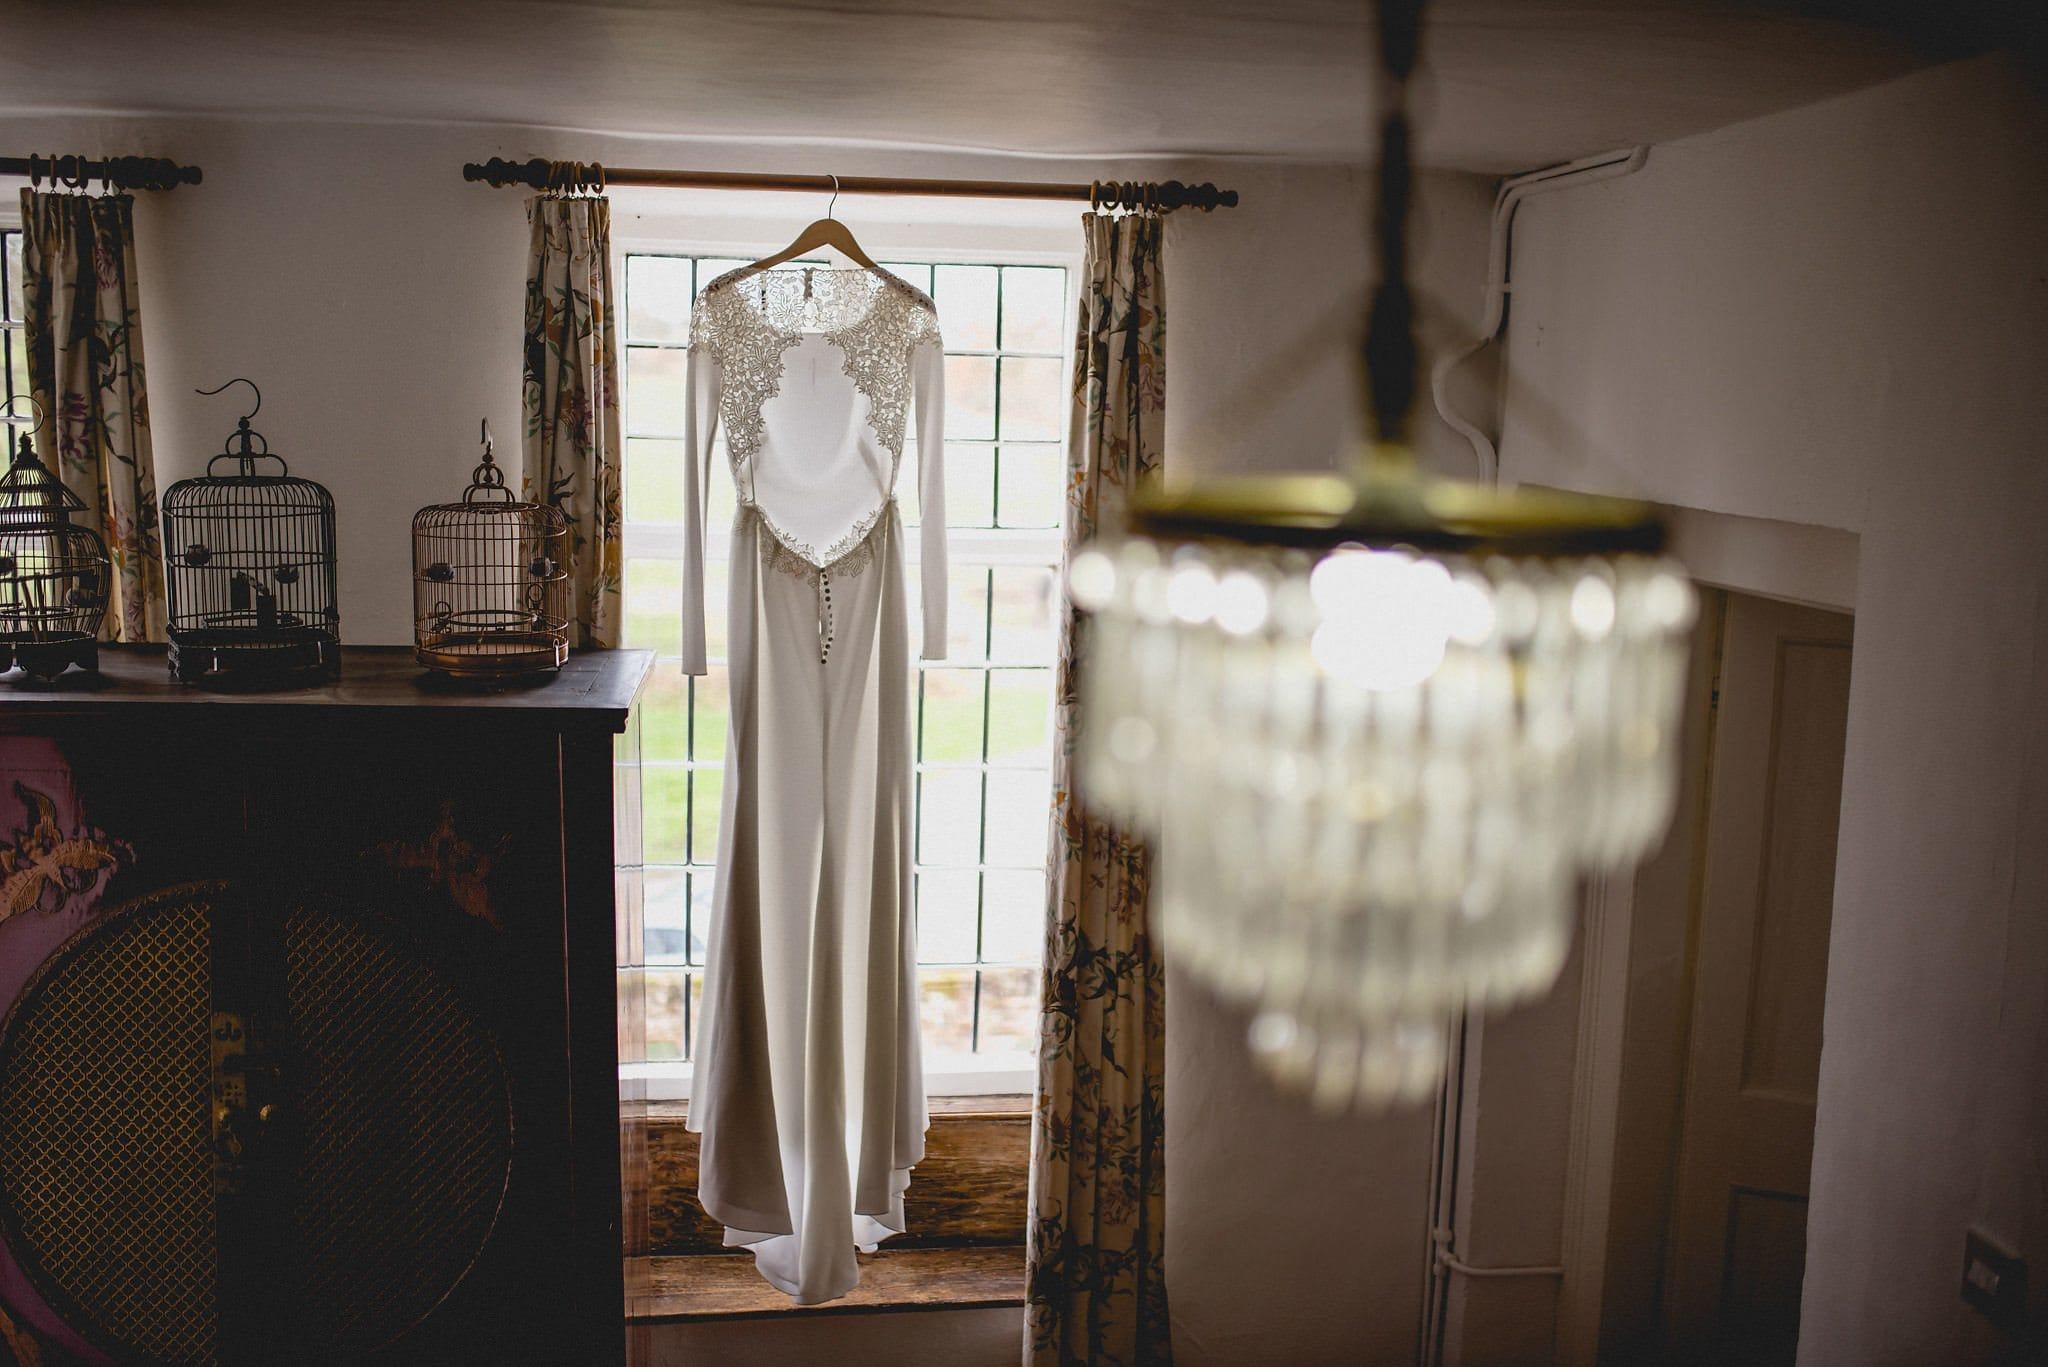 Bride's dress hangs in the window at Littlefield Manor